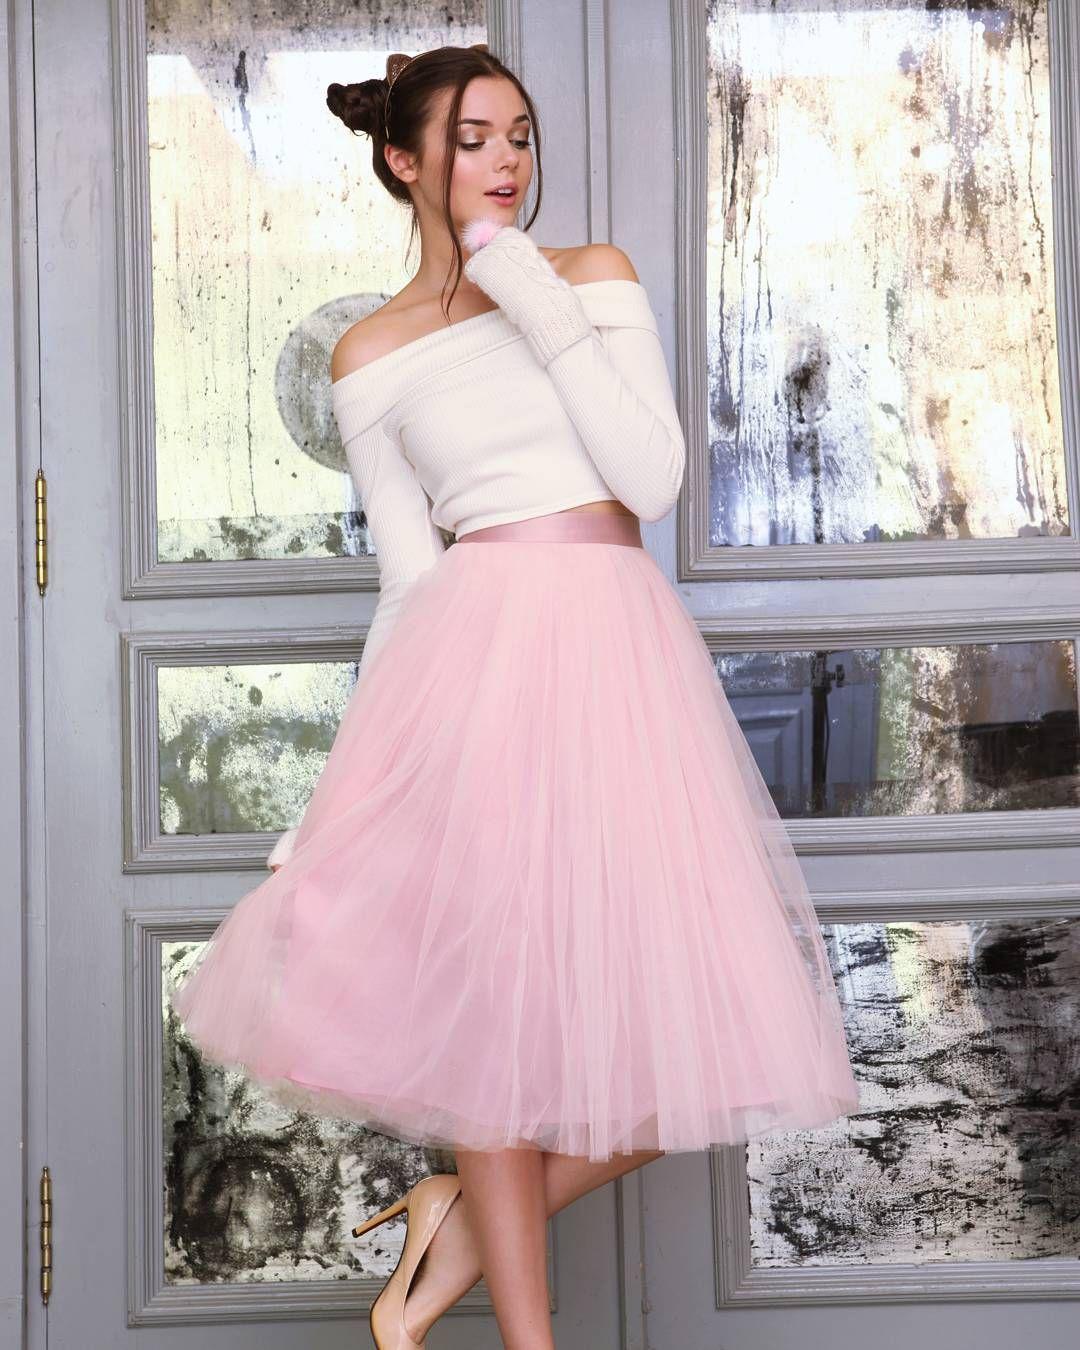 Pin de Ludmila en vestidos | Pinterest